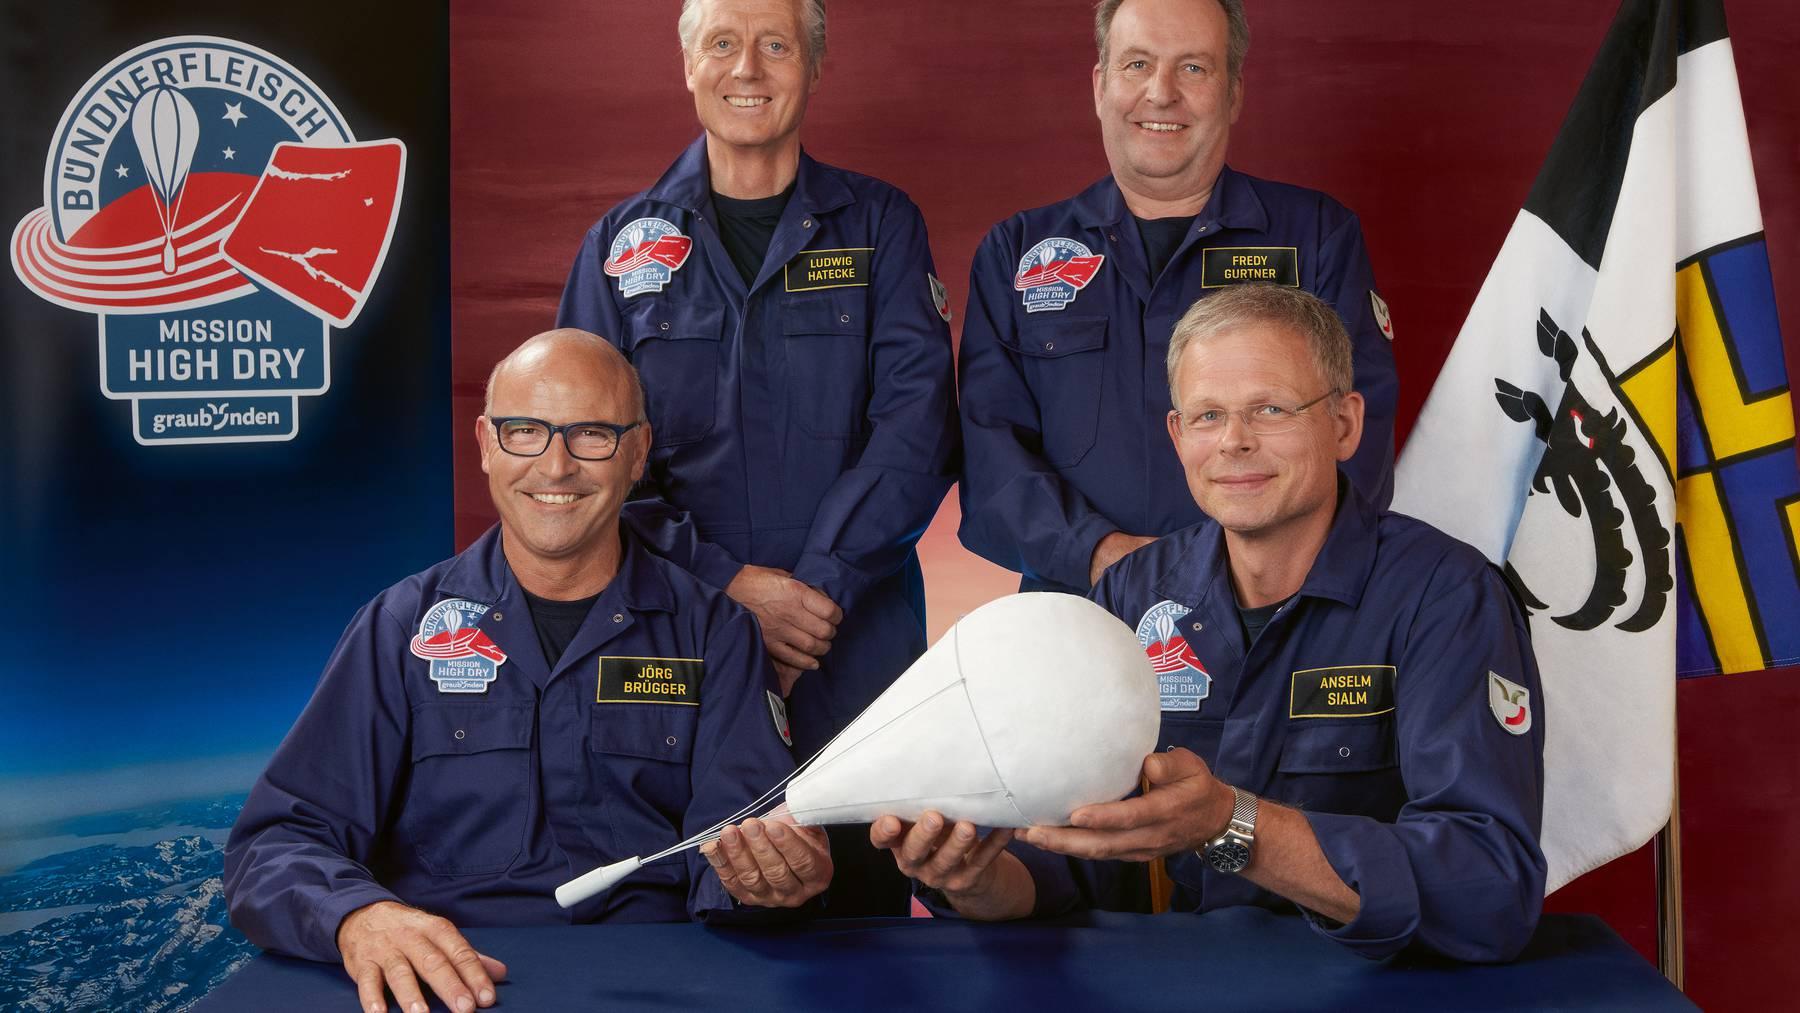 Mission High Dry Crew Portrait